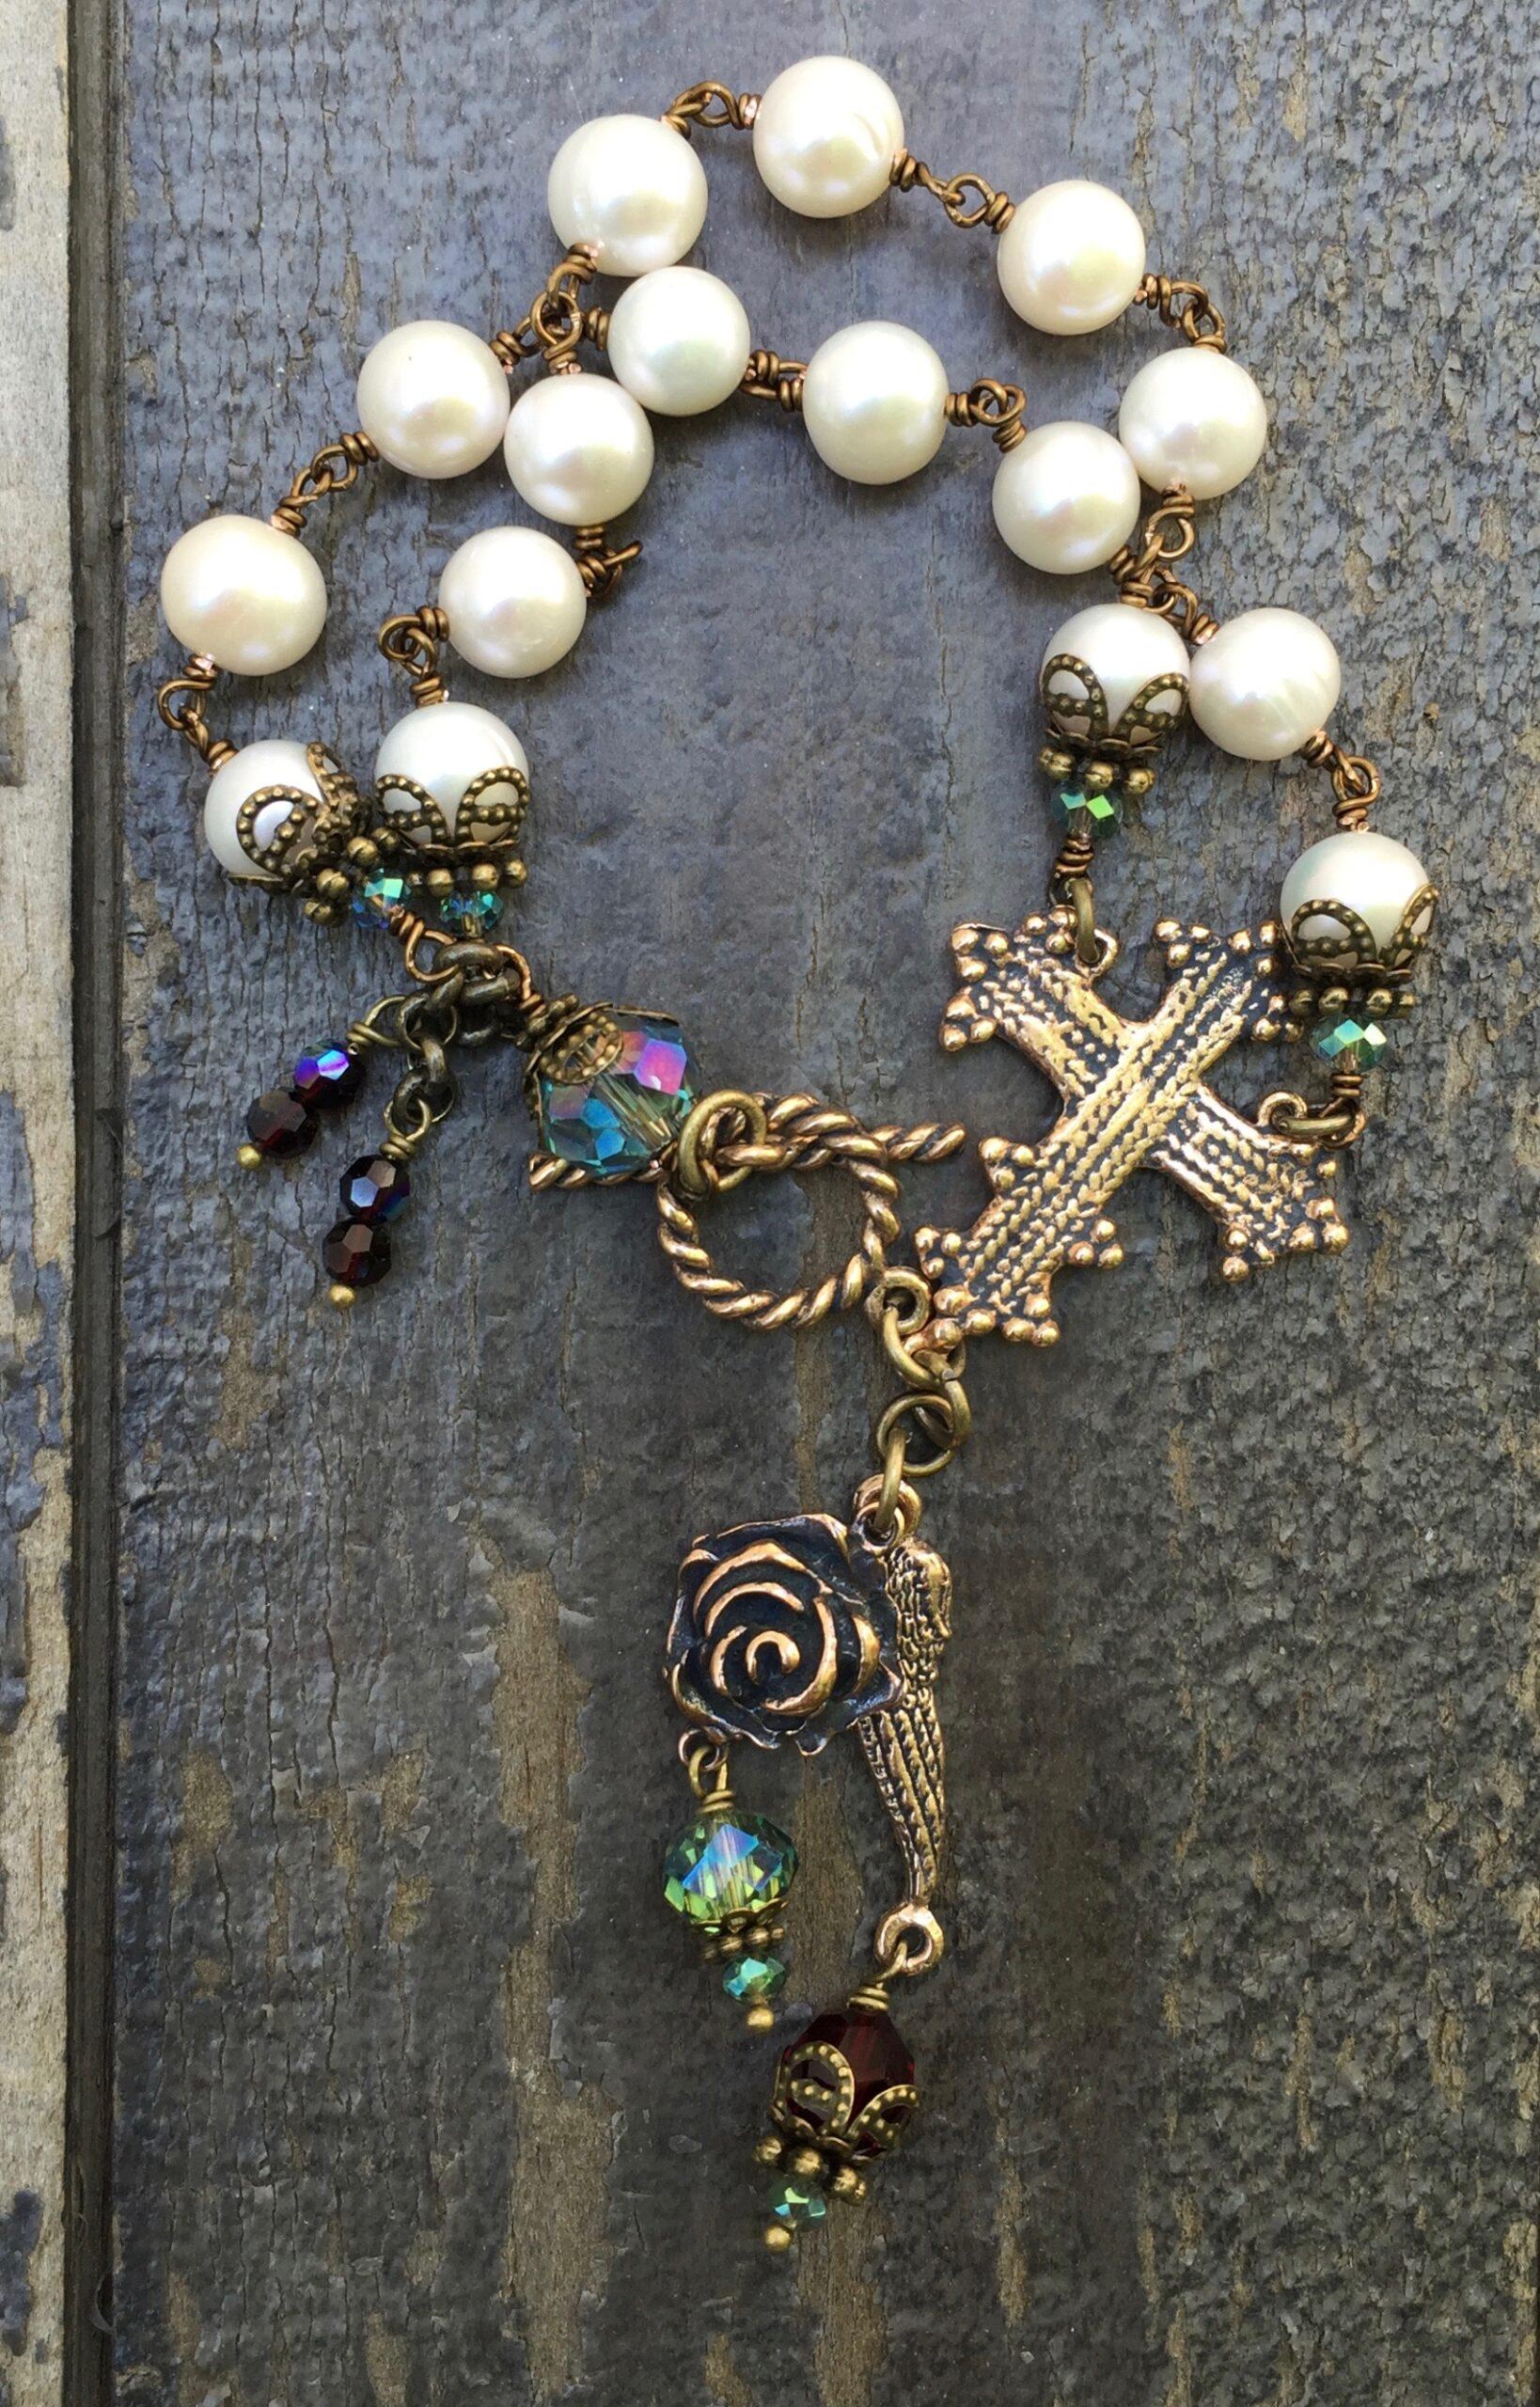 Cream Pearl with Aqua and Garnet Crystal Bracelet – 8mm